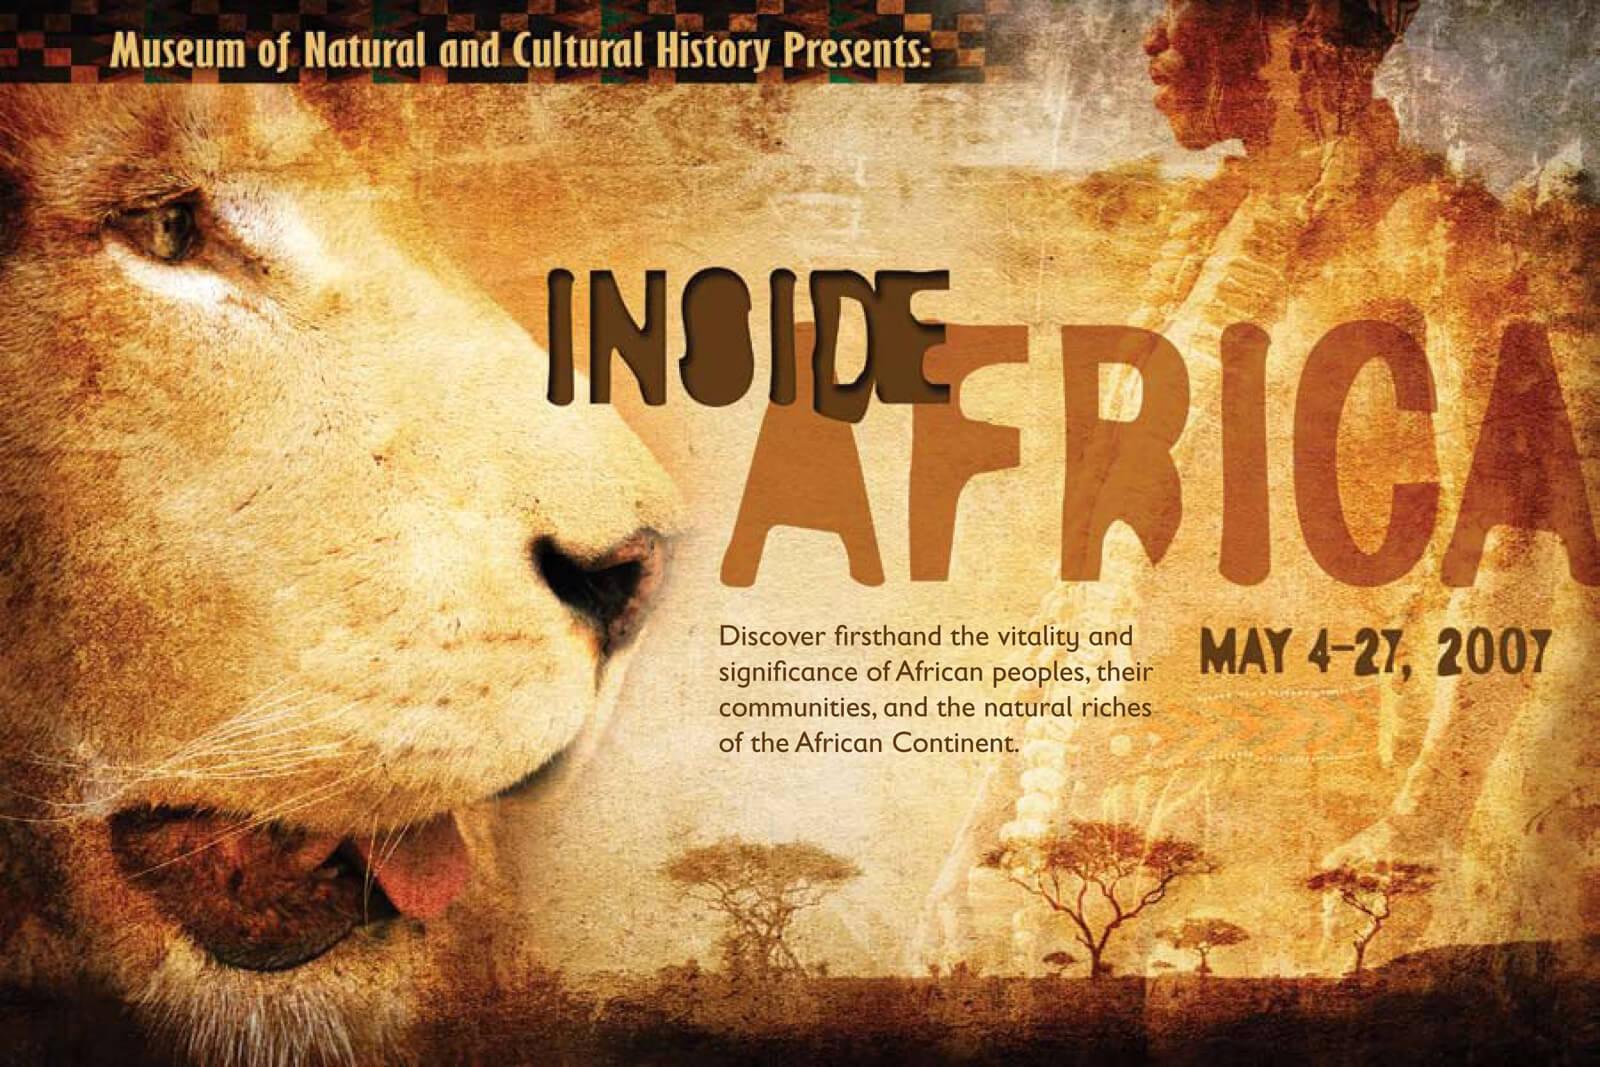 Inside Africa by ridekrisride